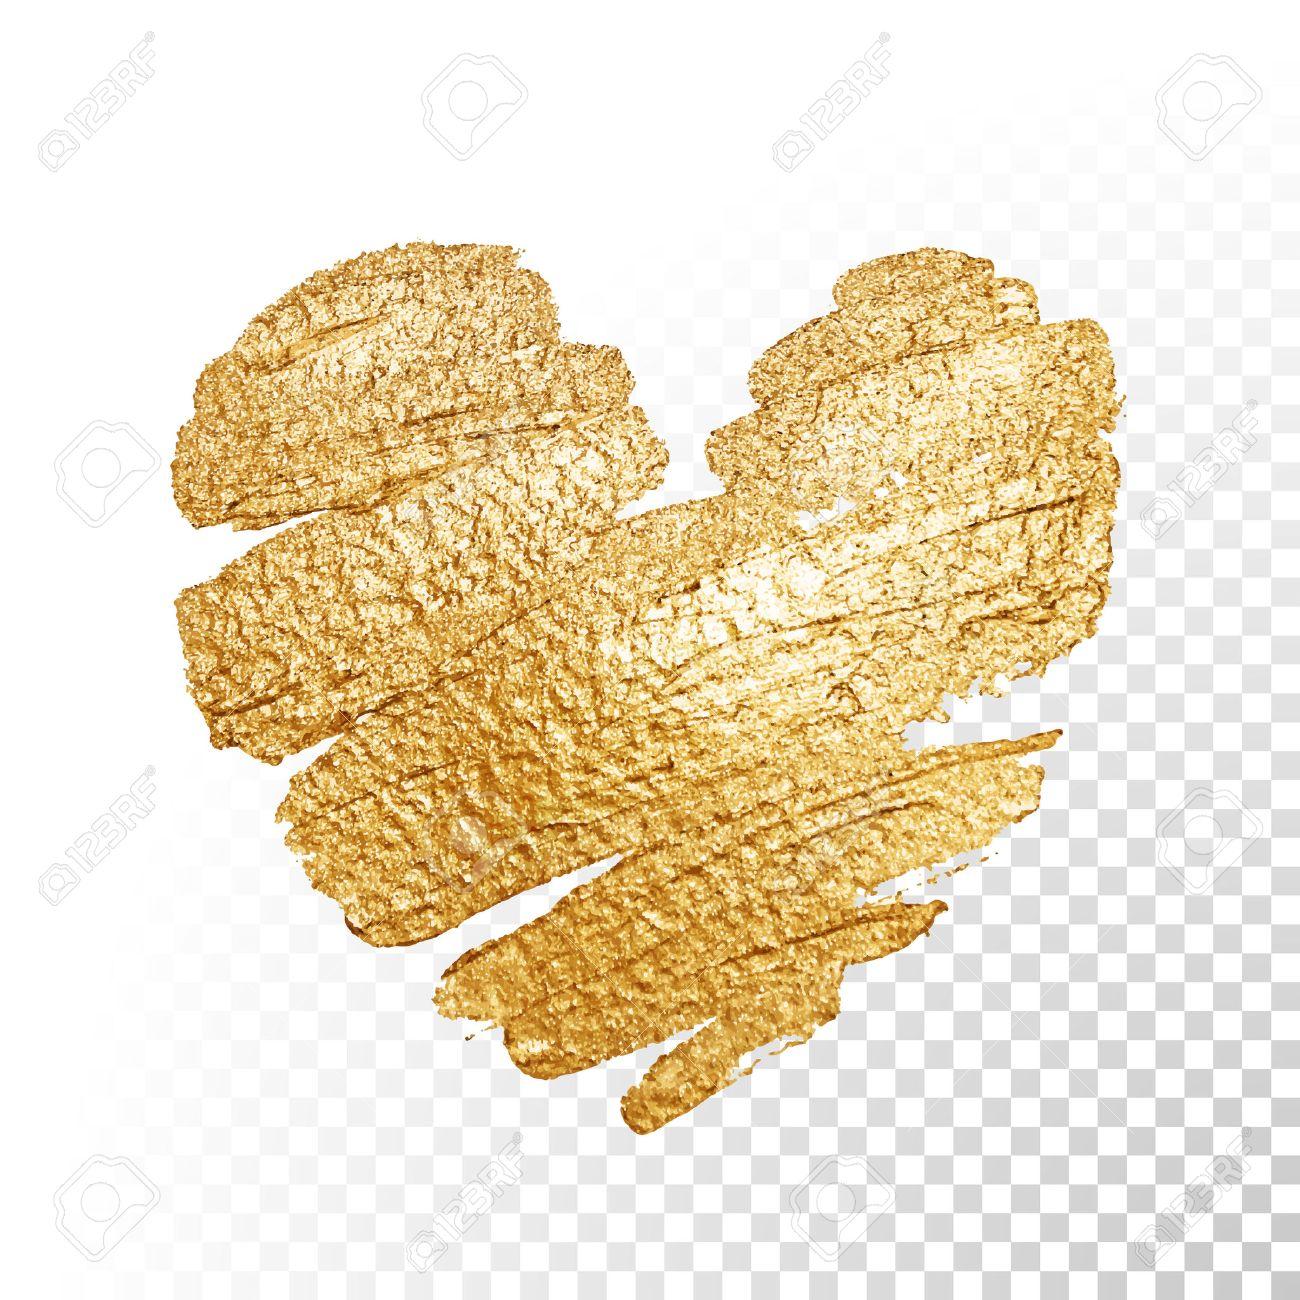 Vector gold paint heart on transparent background. Love concept design. - 50443825